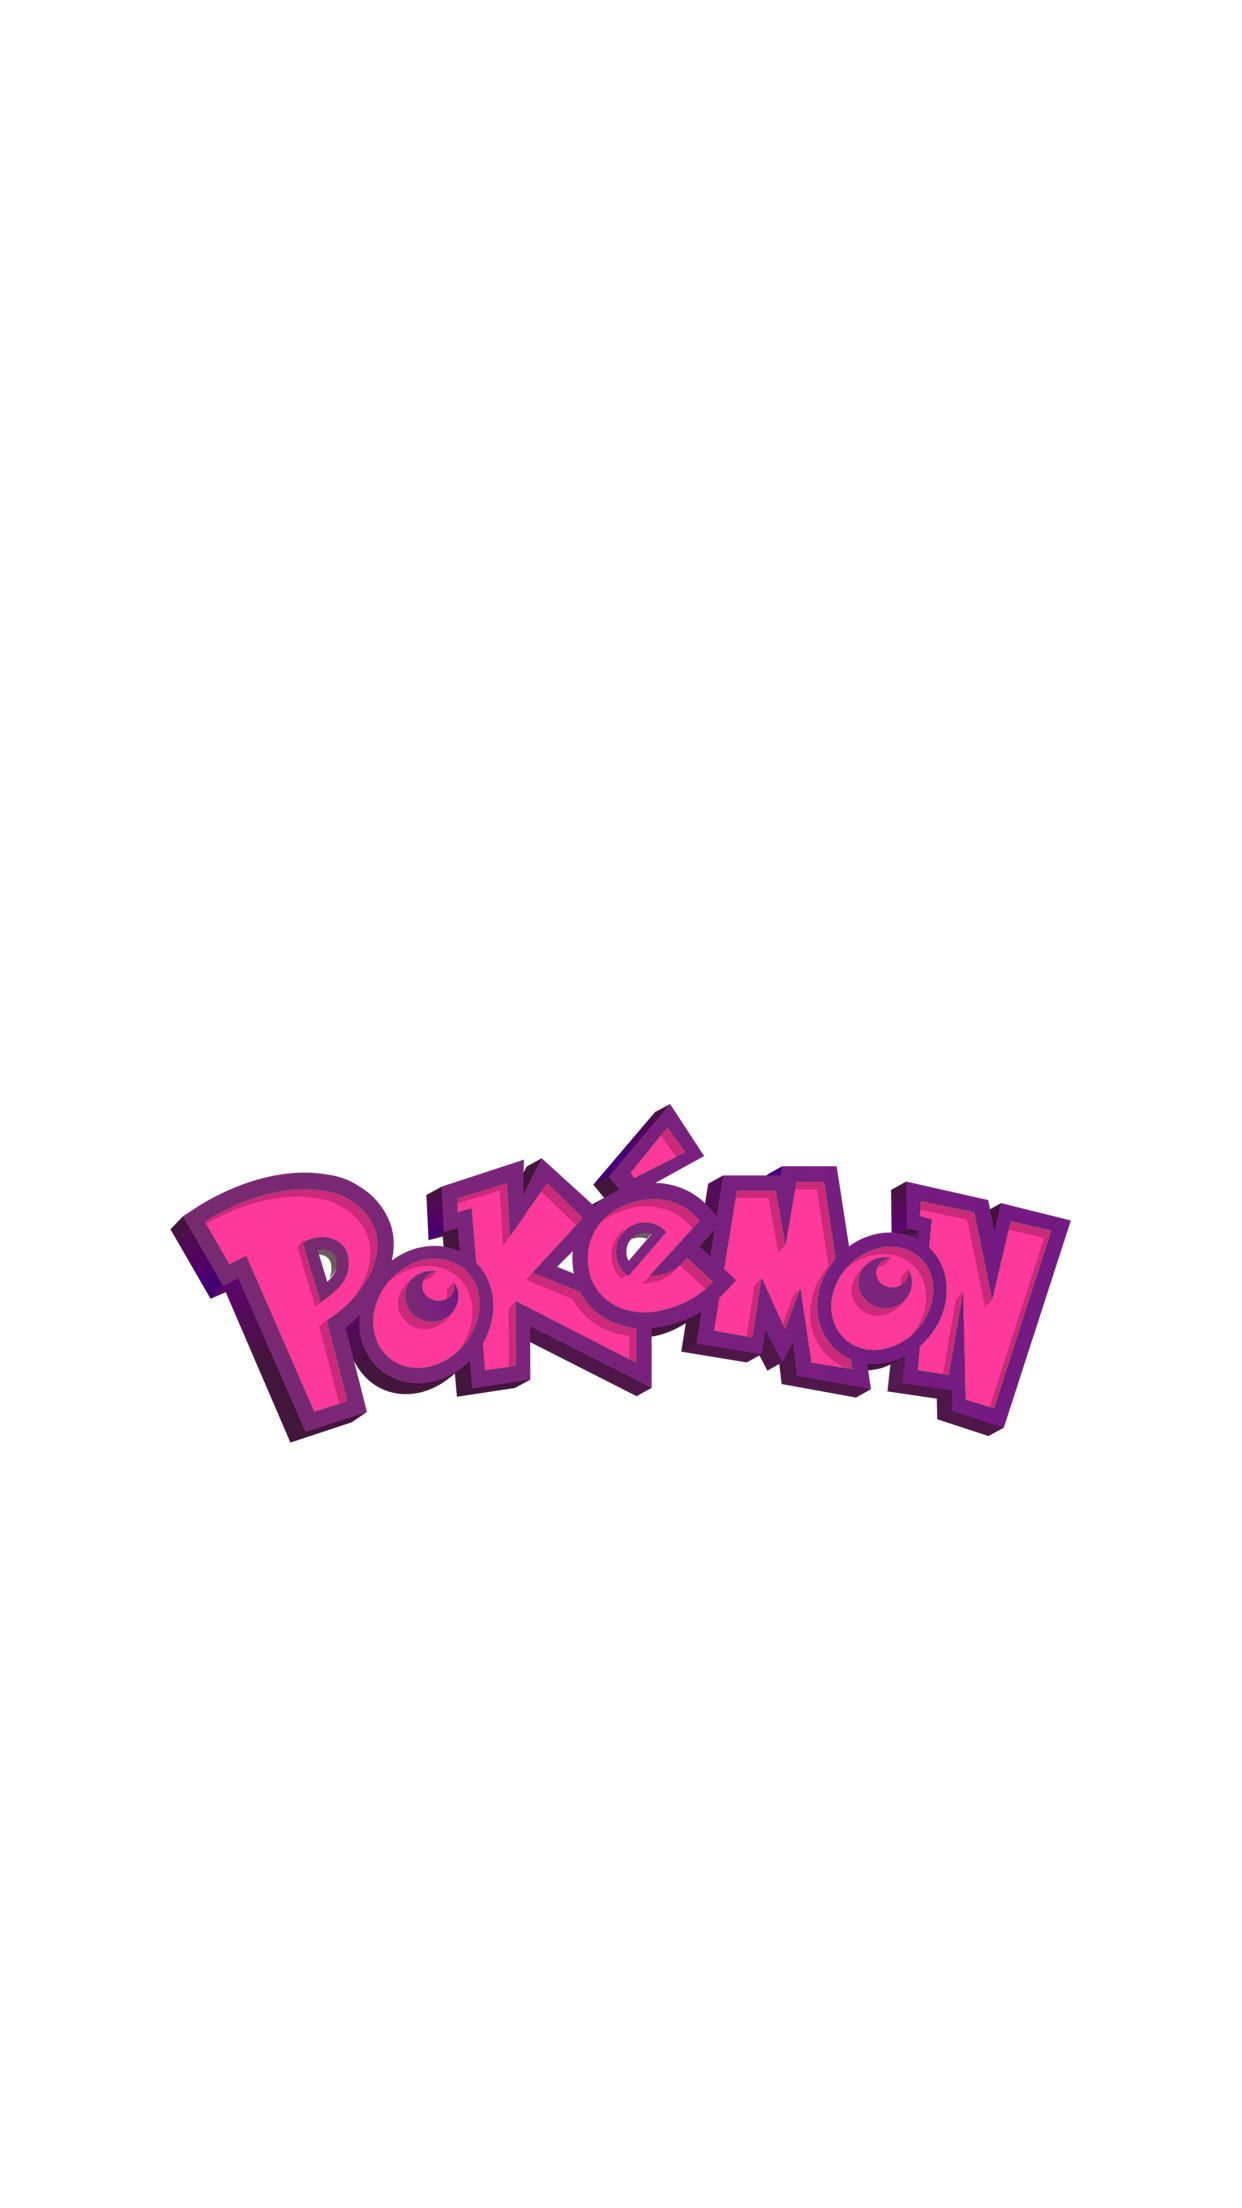 pokemon, pokemon go, pink, wallpaper, hd, cute, background, iphone